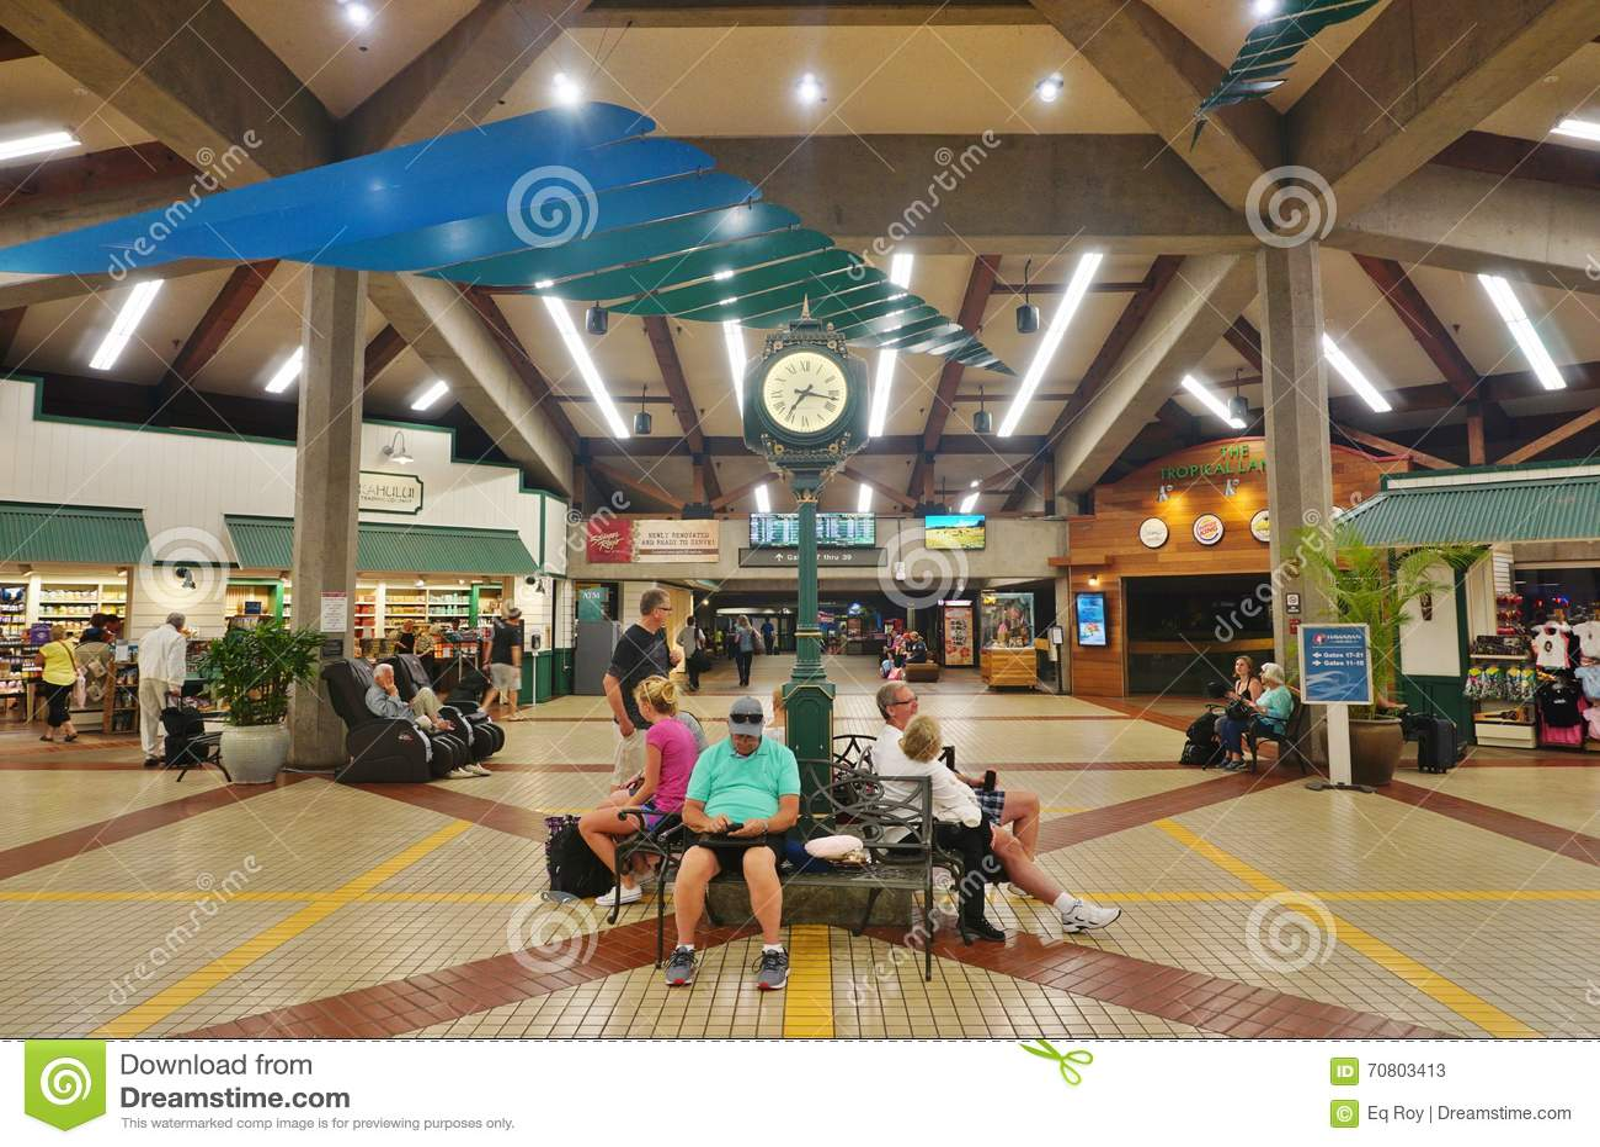 L aeroporto di Kahului (OGG) in Maui, Hawai